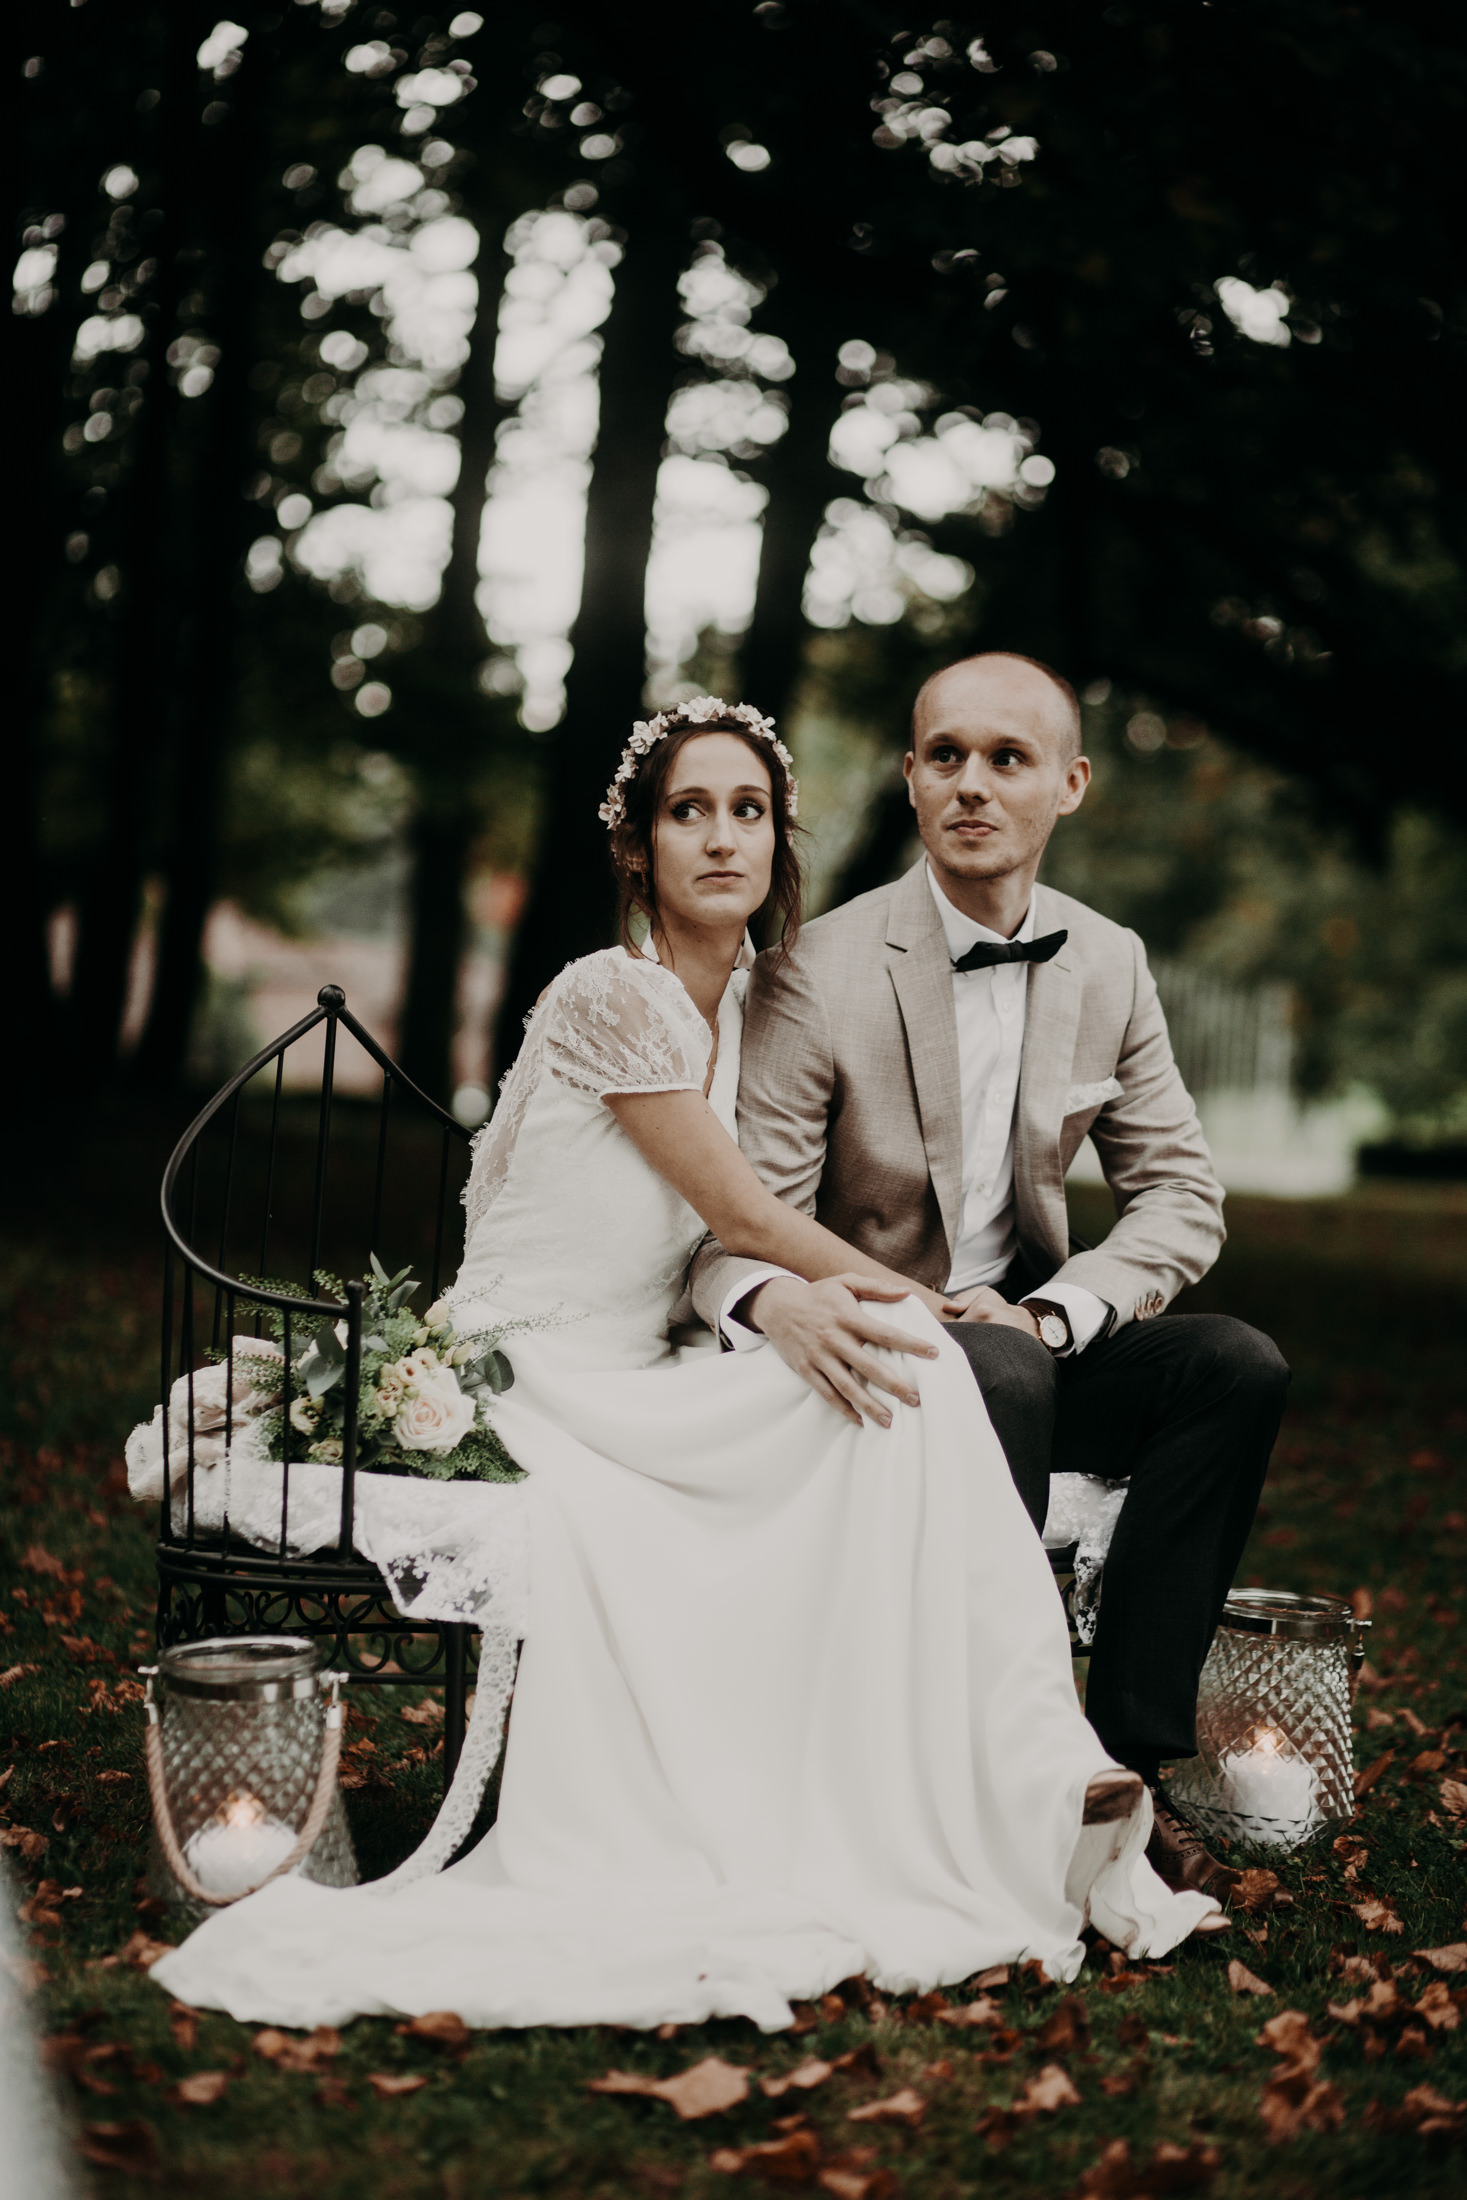 Mariage auvergne photographe wedding_-55.jpg